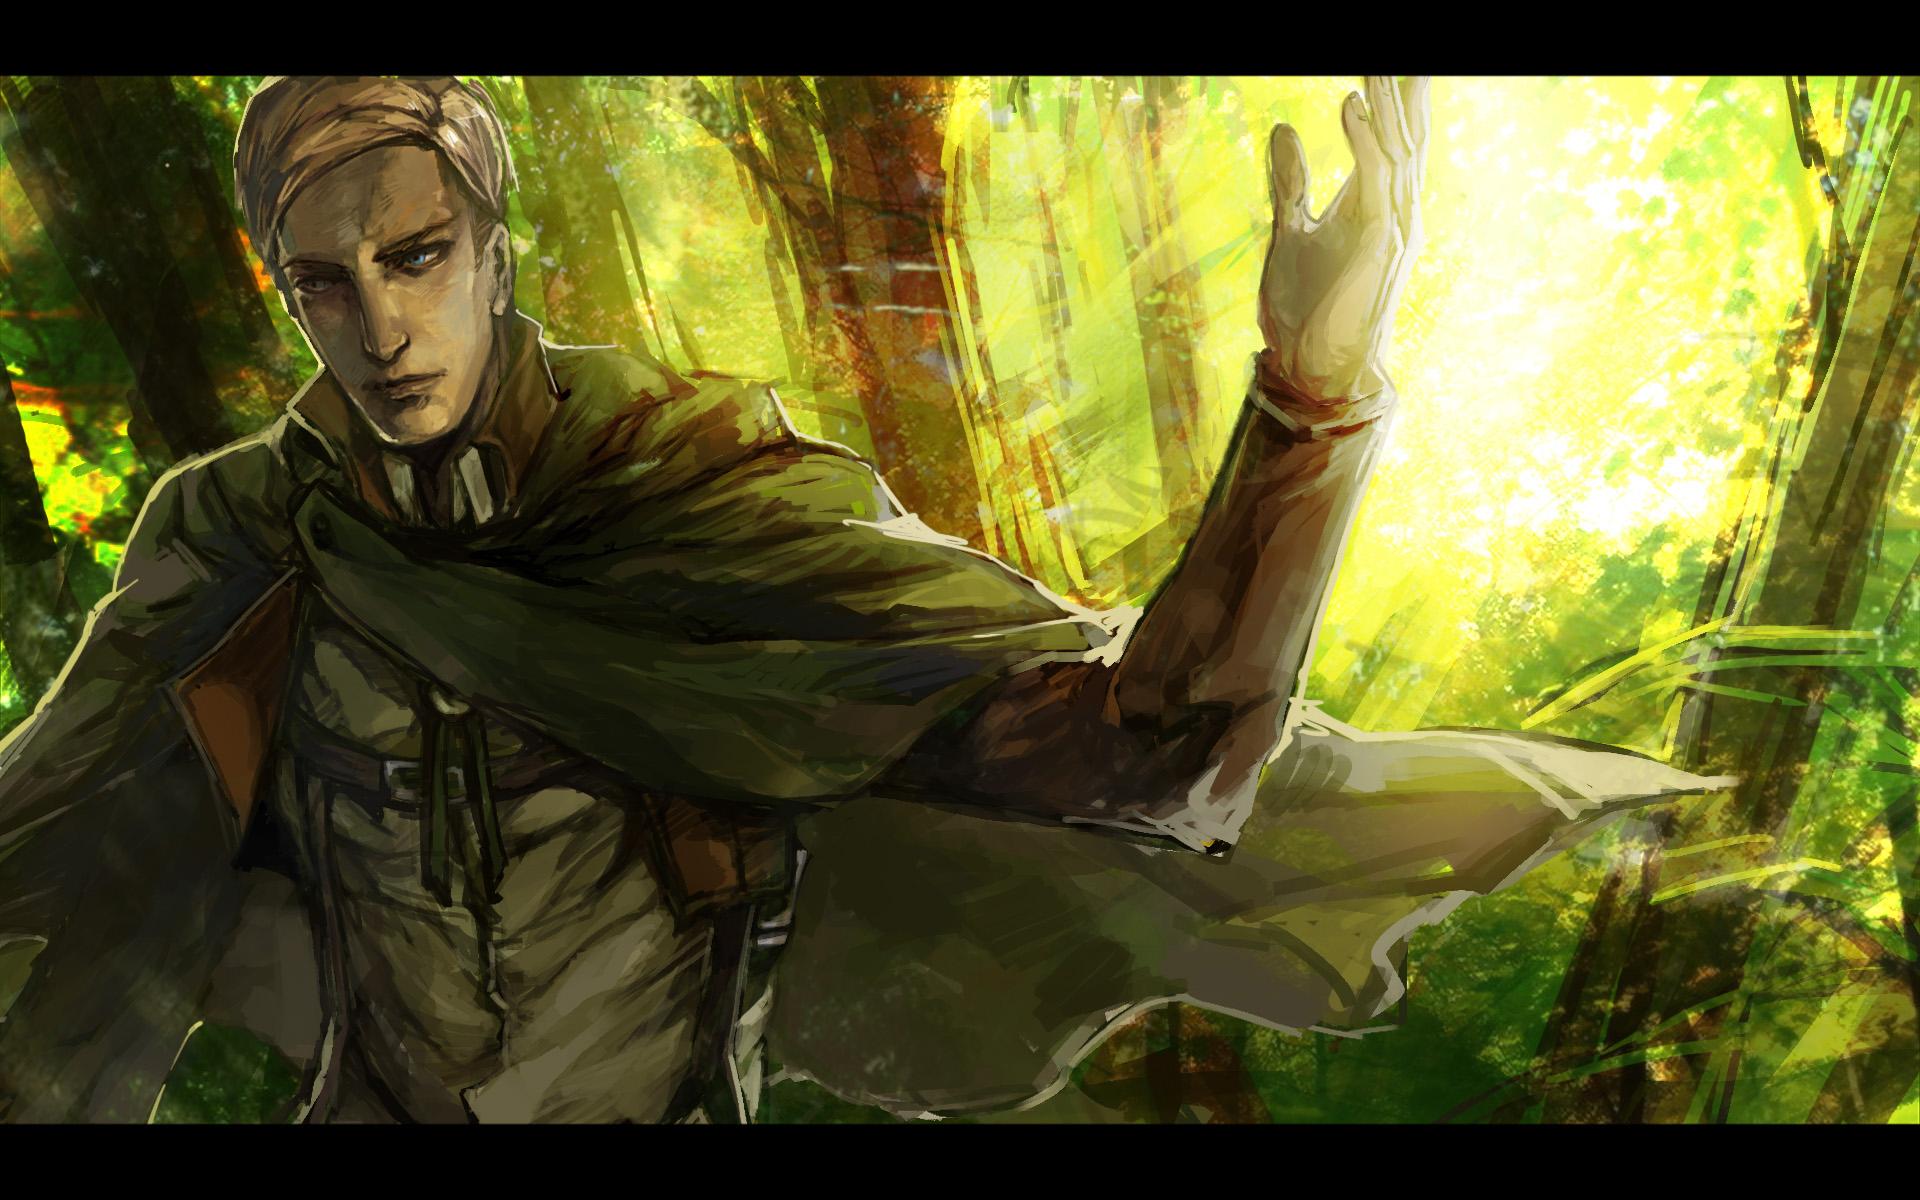 Erwin Smith Attack On Titan Wallpaper 1596713 Zerochan Anime Image Board